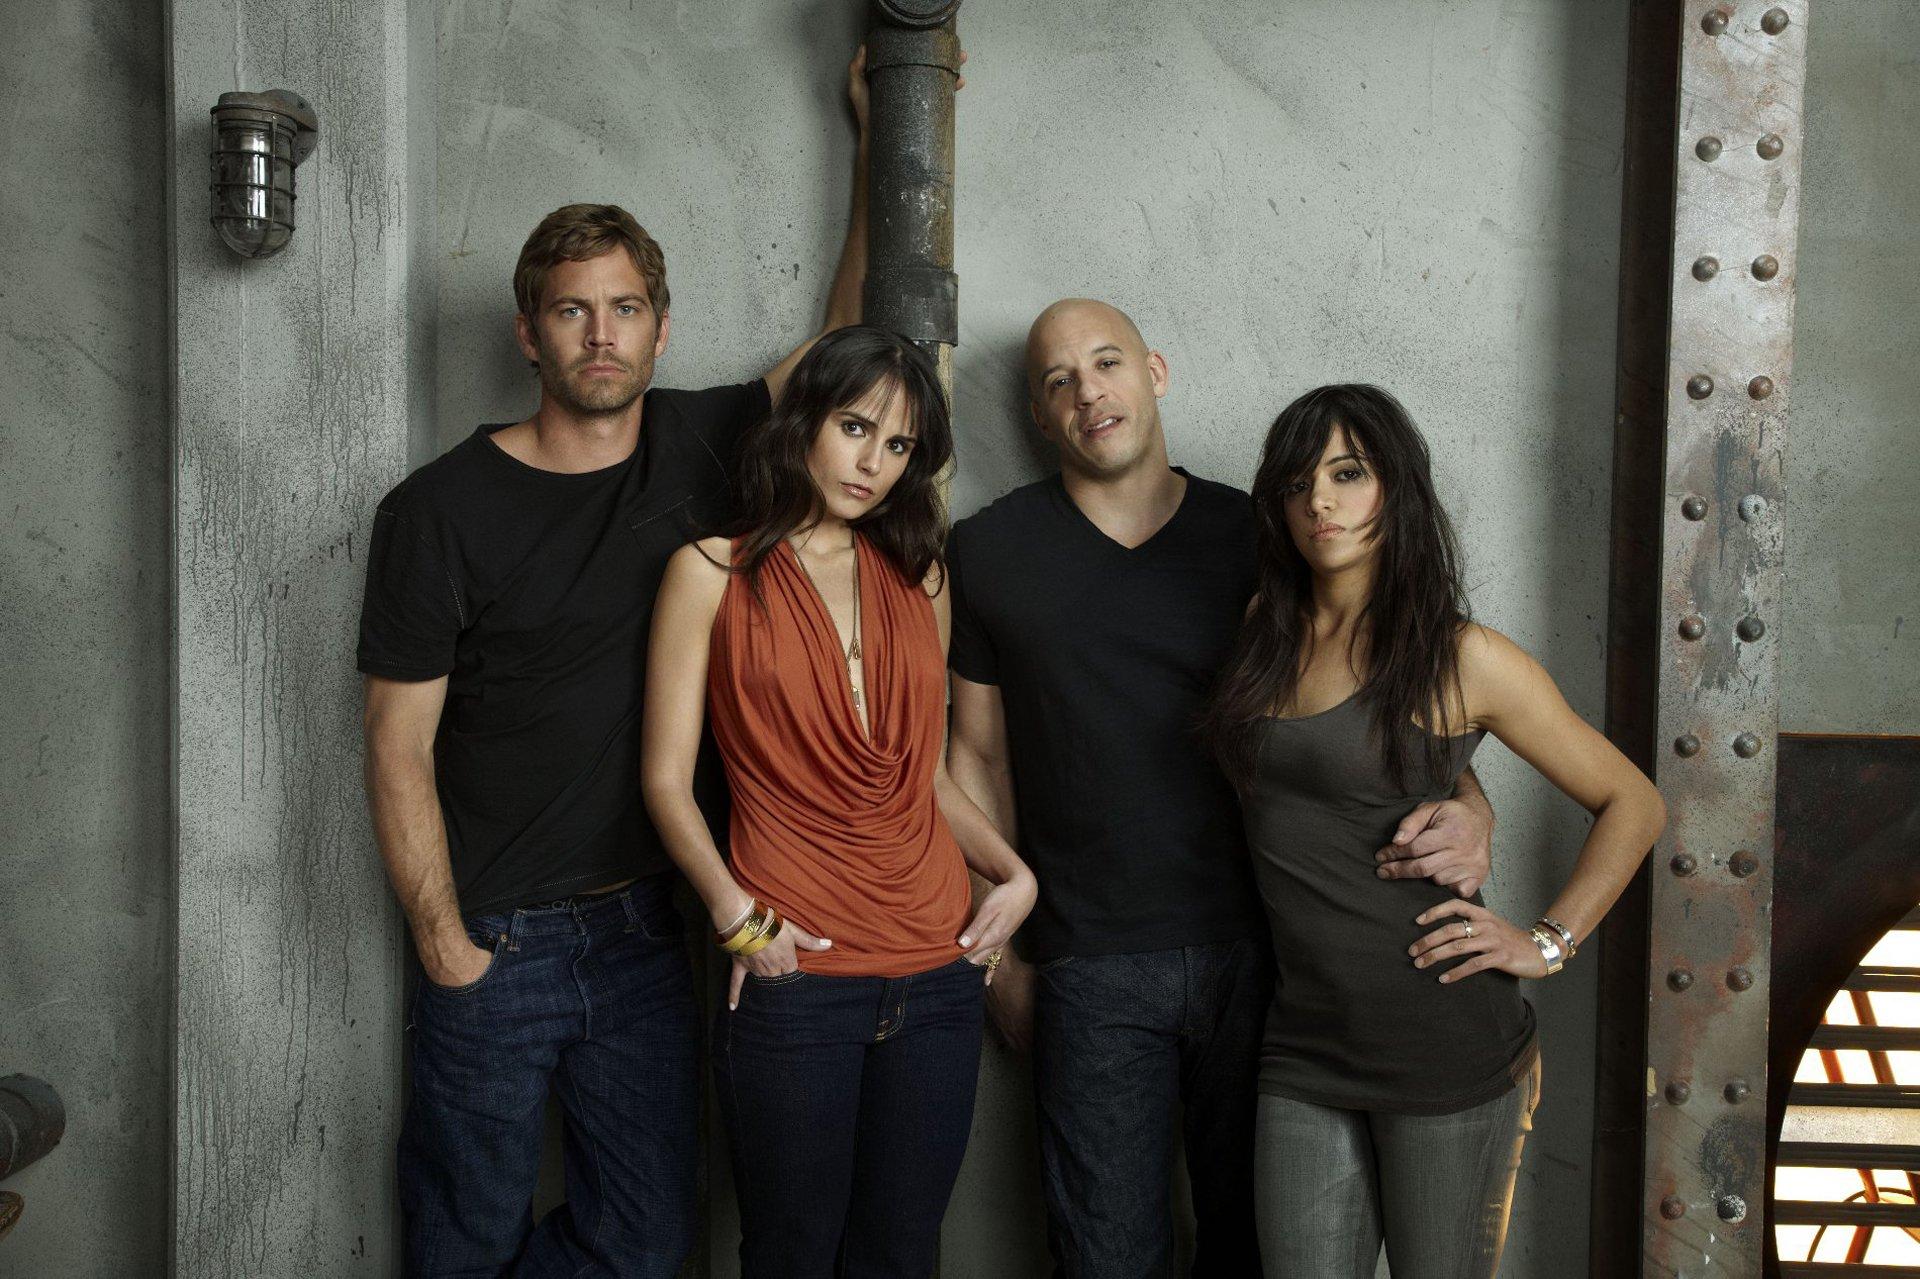 Movie - Fast & Furious  Vin Diesel Dominic Toretto Paul Walker Brian O'Conner Jordana Brewster Mia Toretto Michelle Rodriguez Letty Ortiz Wallpaper